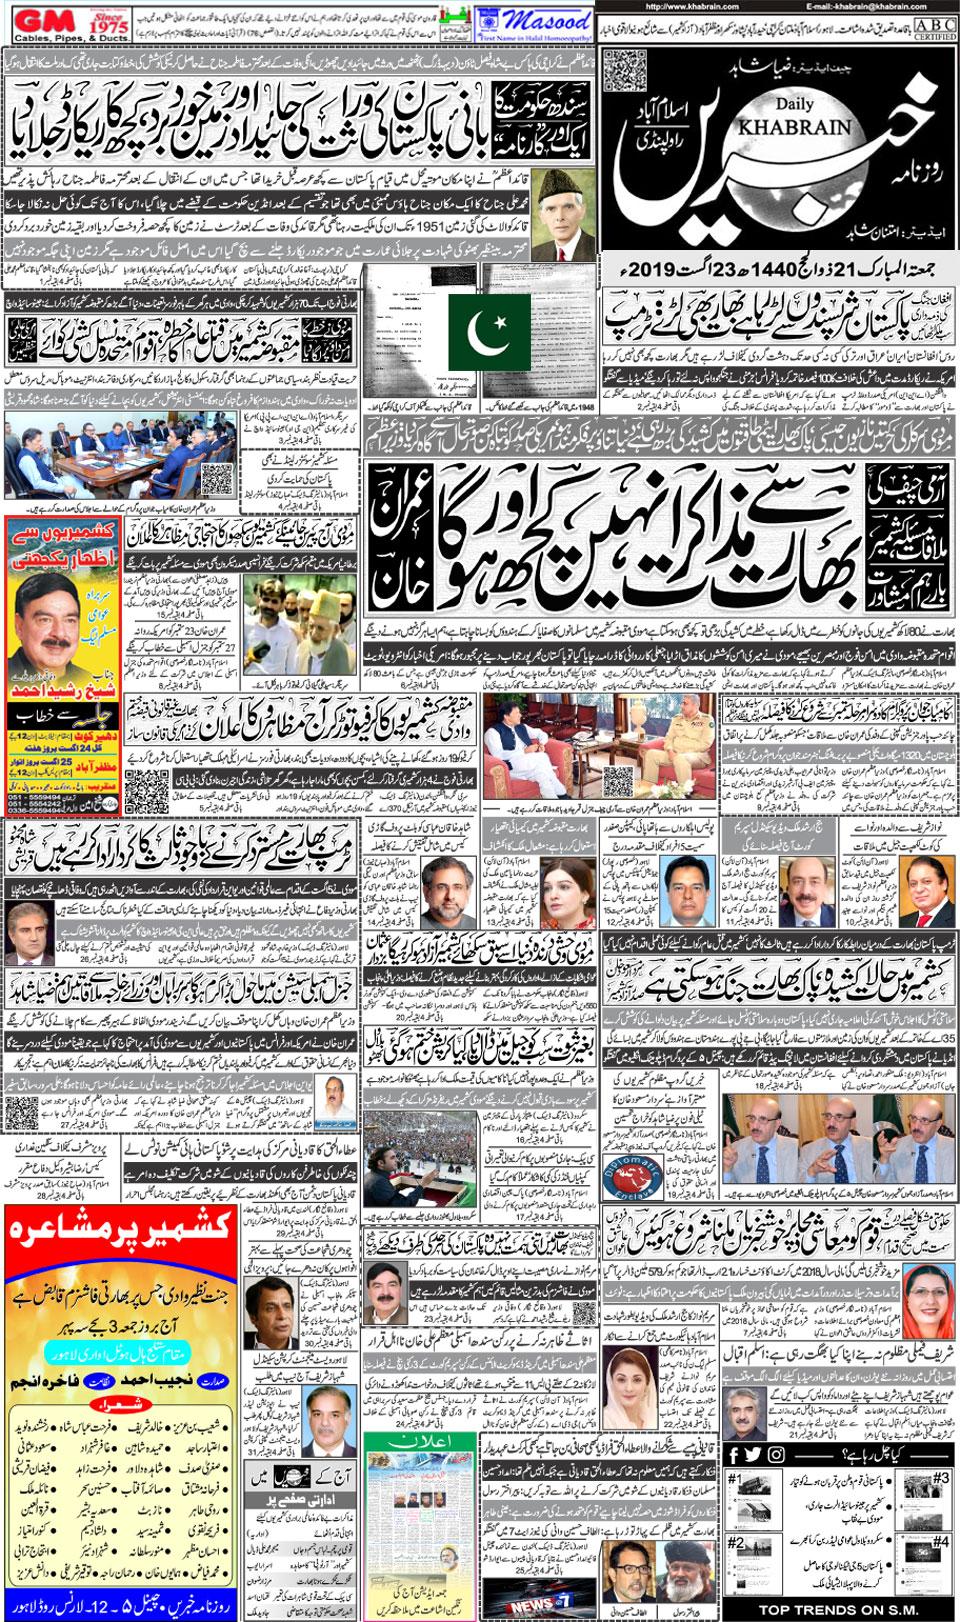 Daily Khabrain ePaper | خبریں | Urdu Khabrain Newspaper